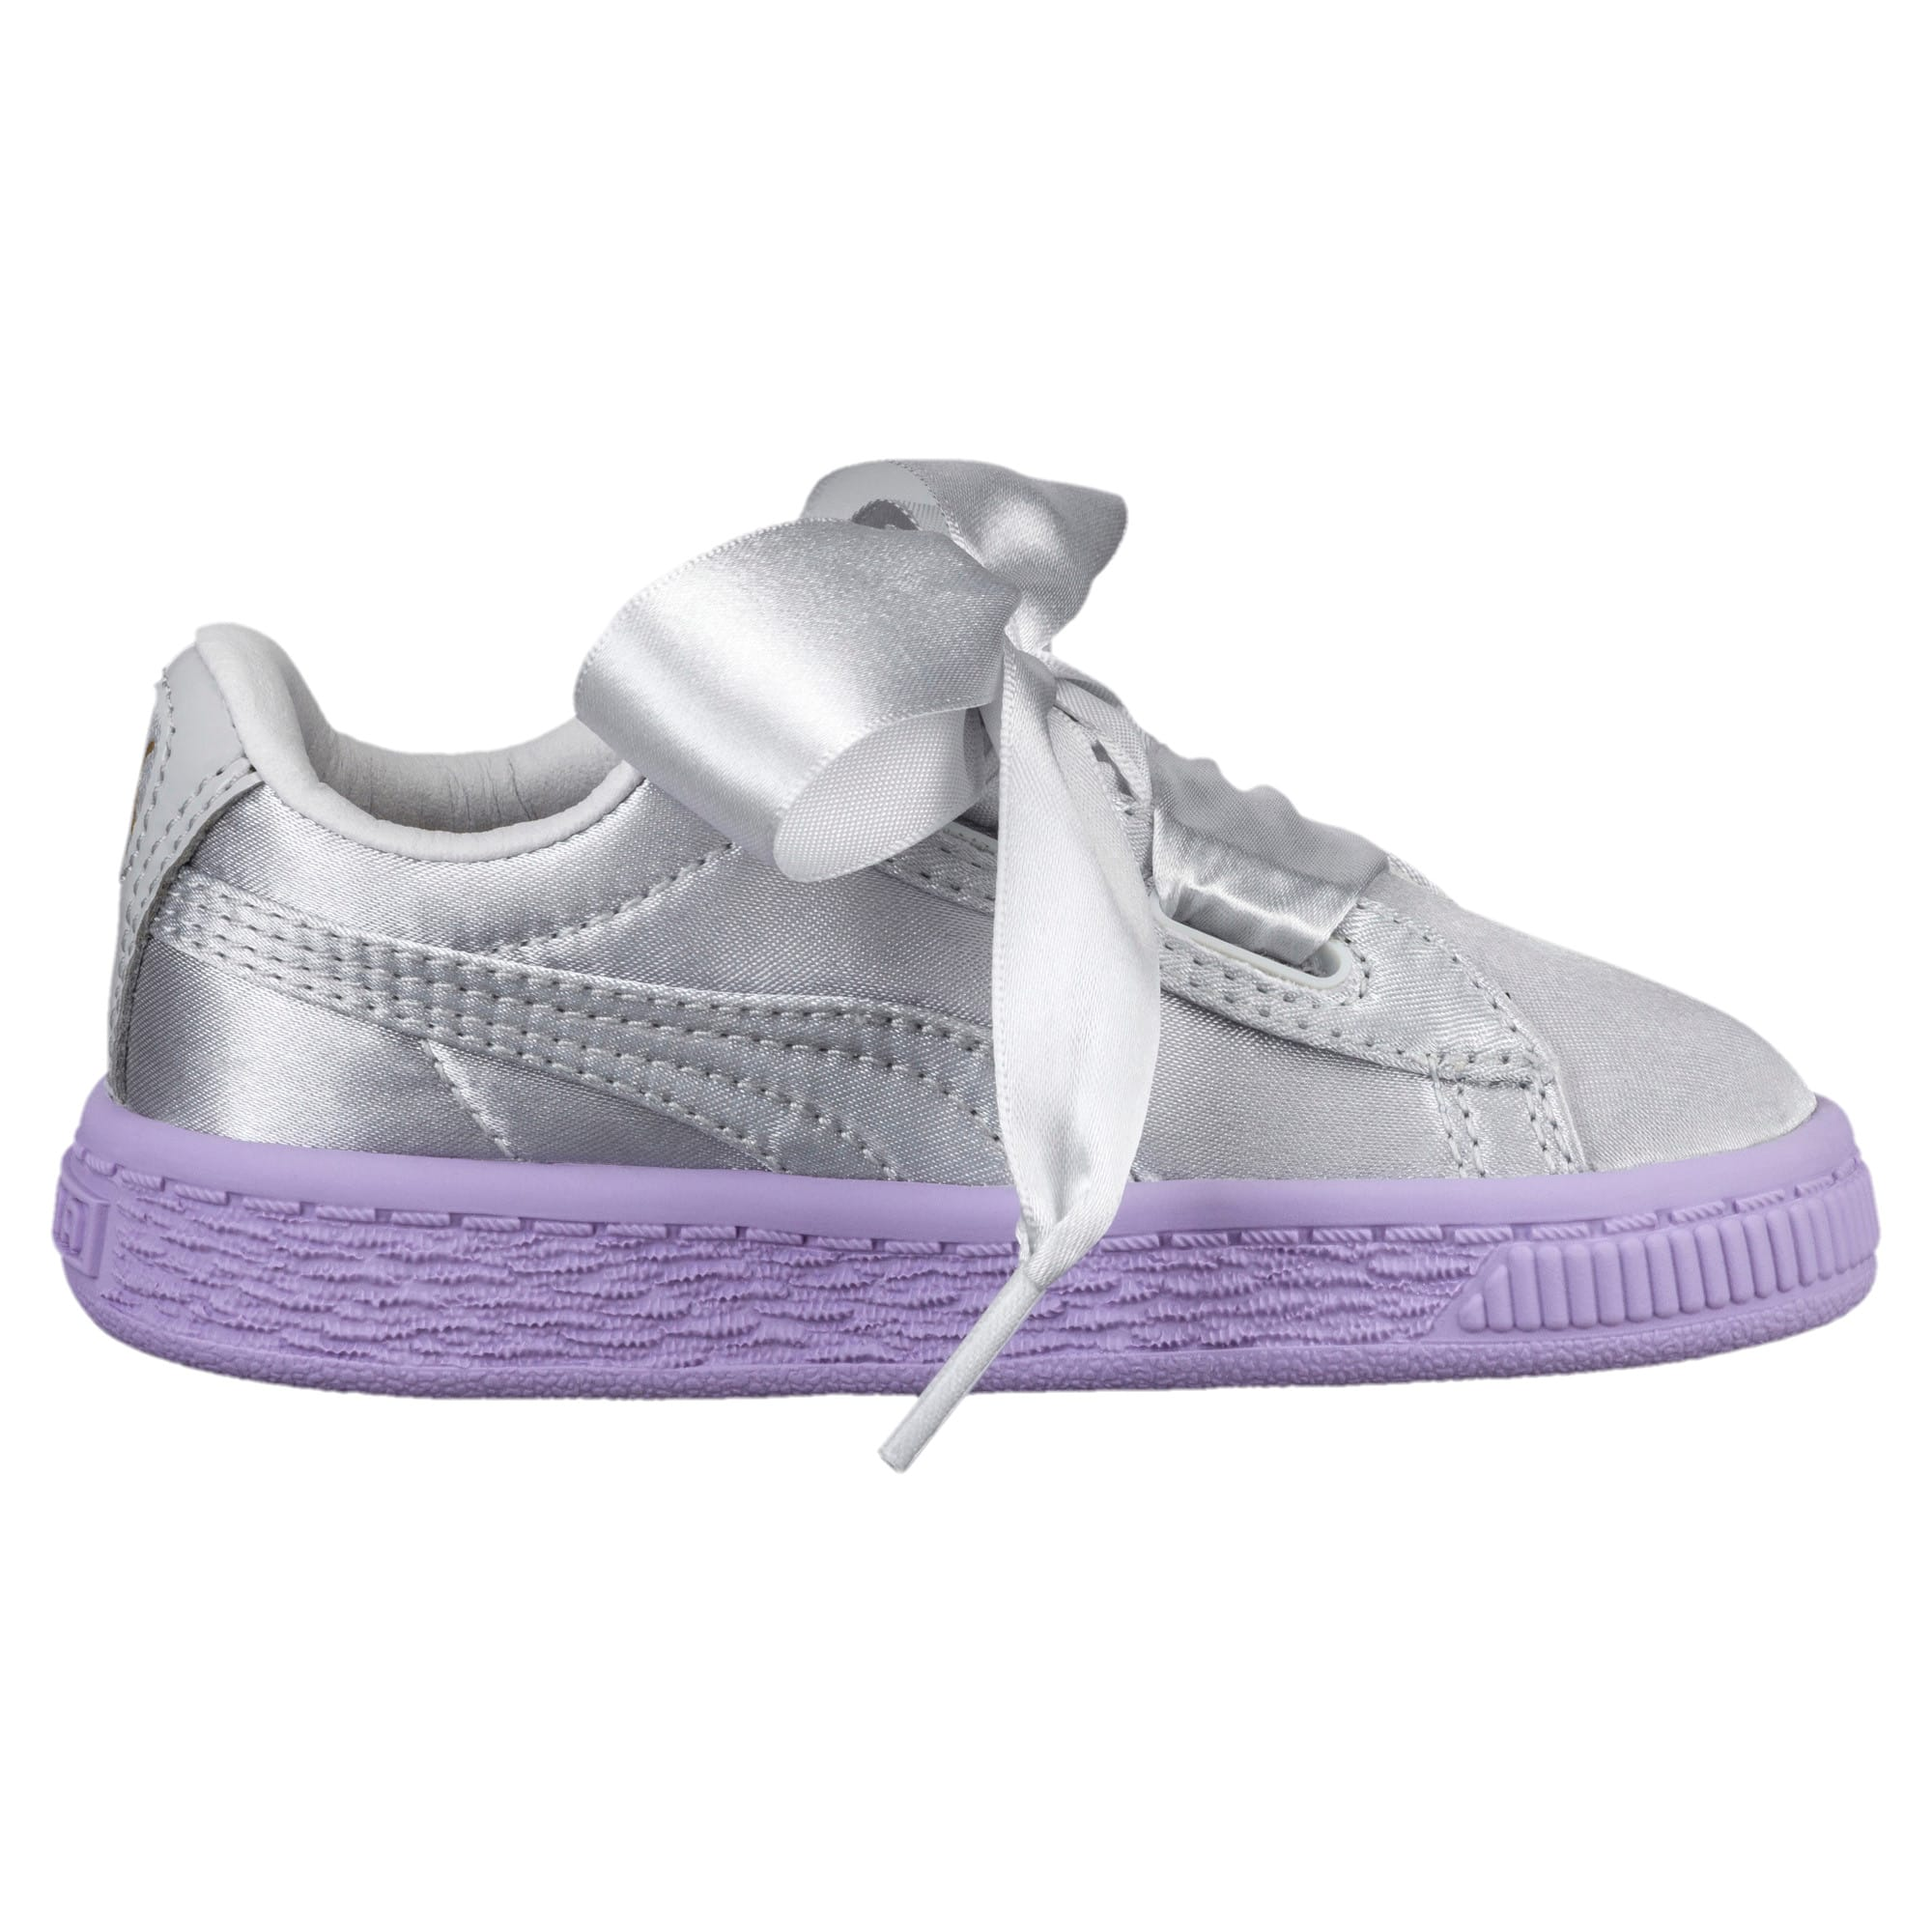 Thumbnail 3 of Basket Heart Toddler Shoes, Glacier Gray-Glacier Gray, medium